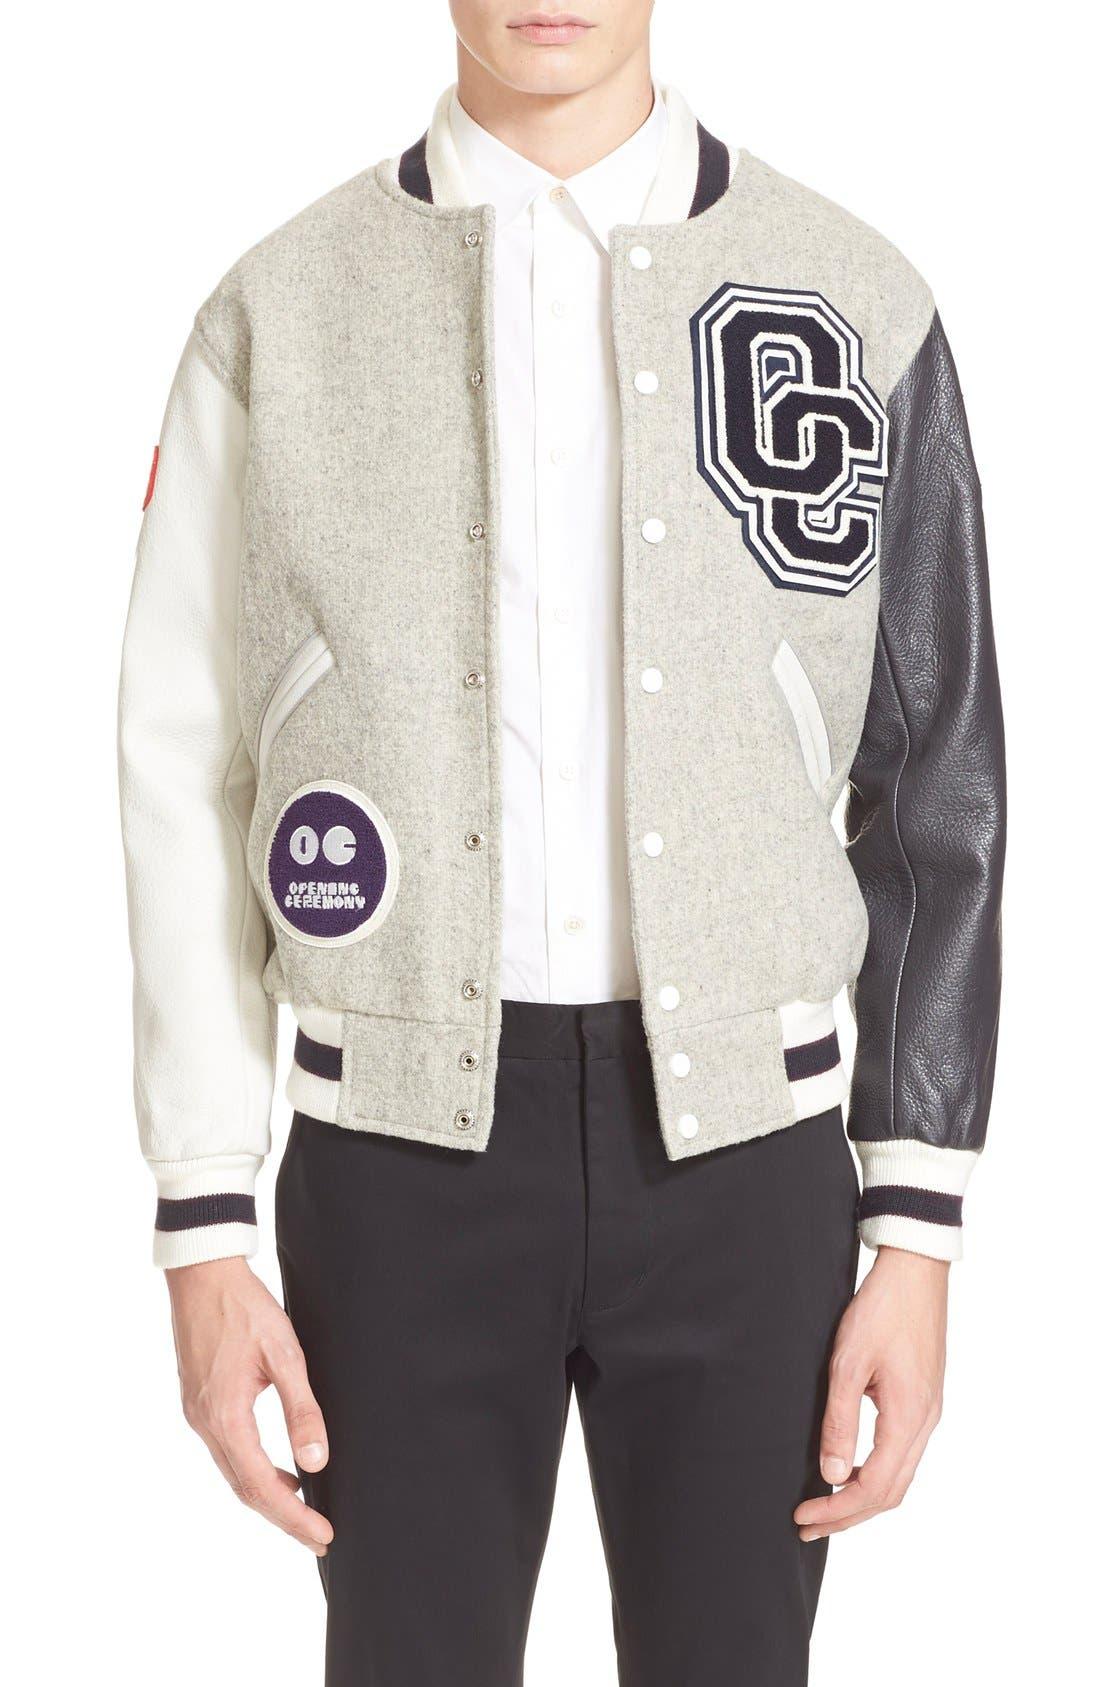 Opening Ceremony 'OC Classic' Varsity Jacket